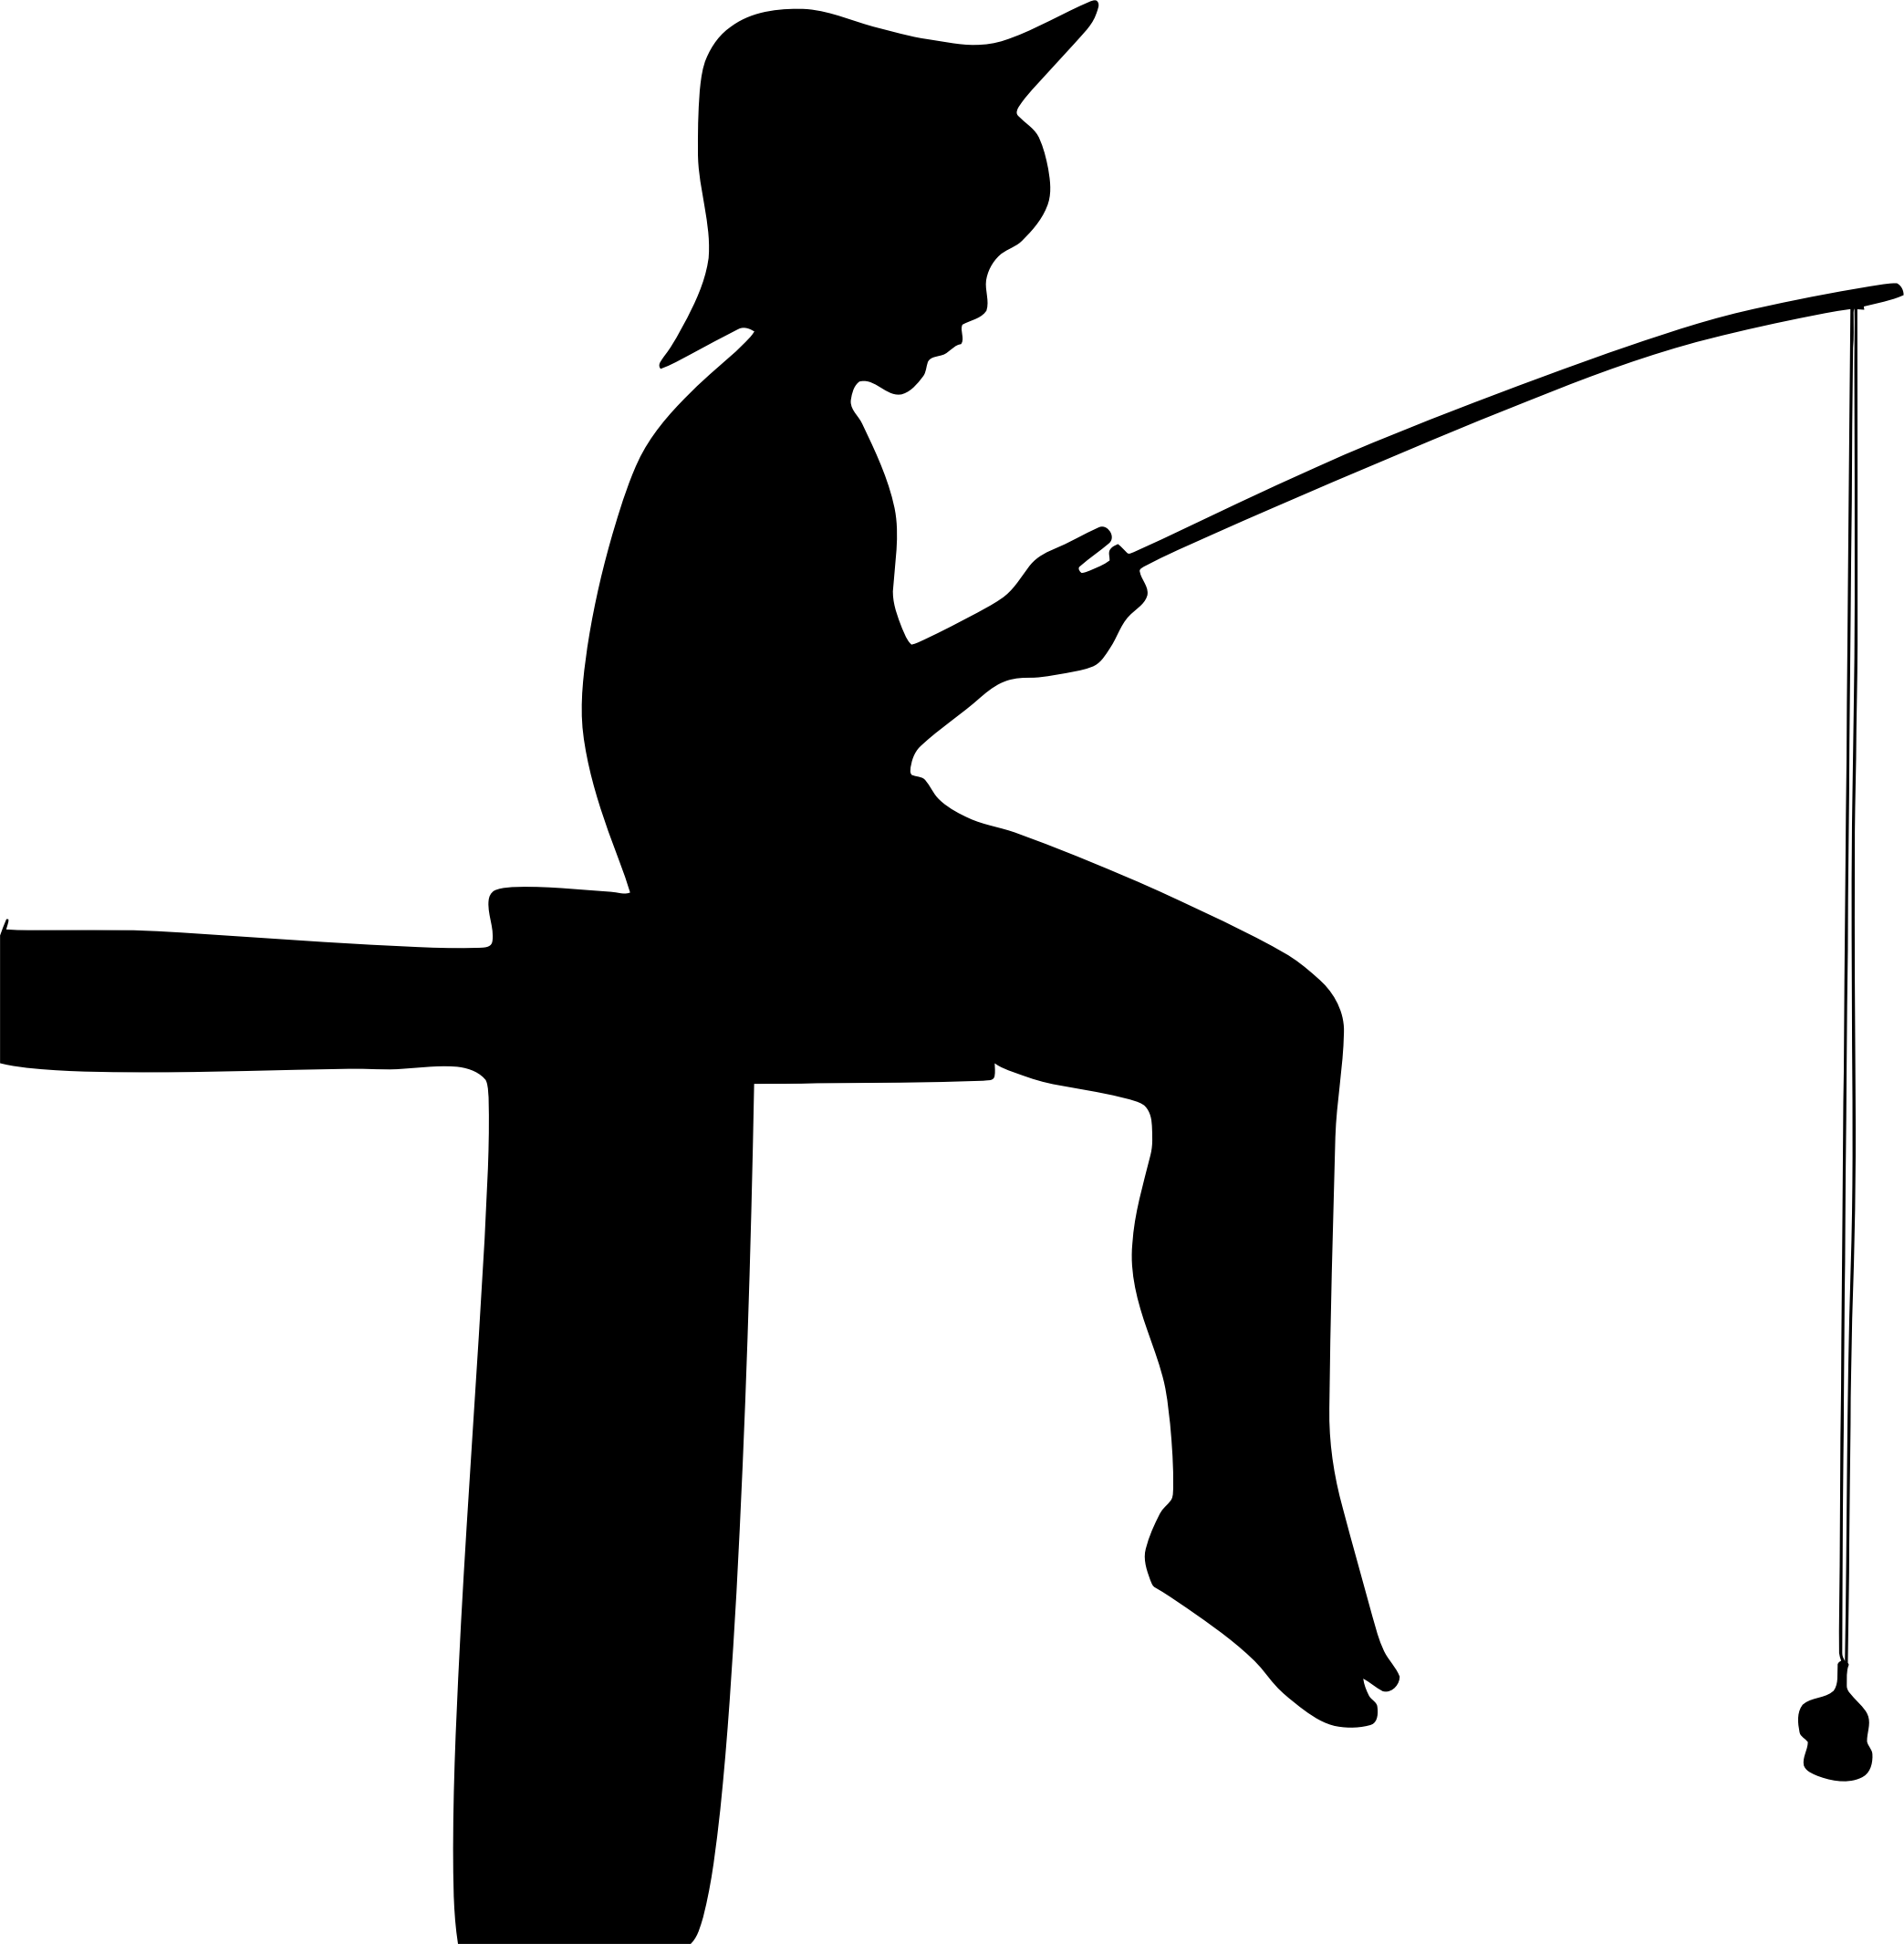 2087x2131 Clipart